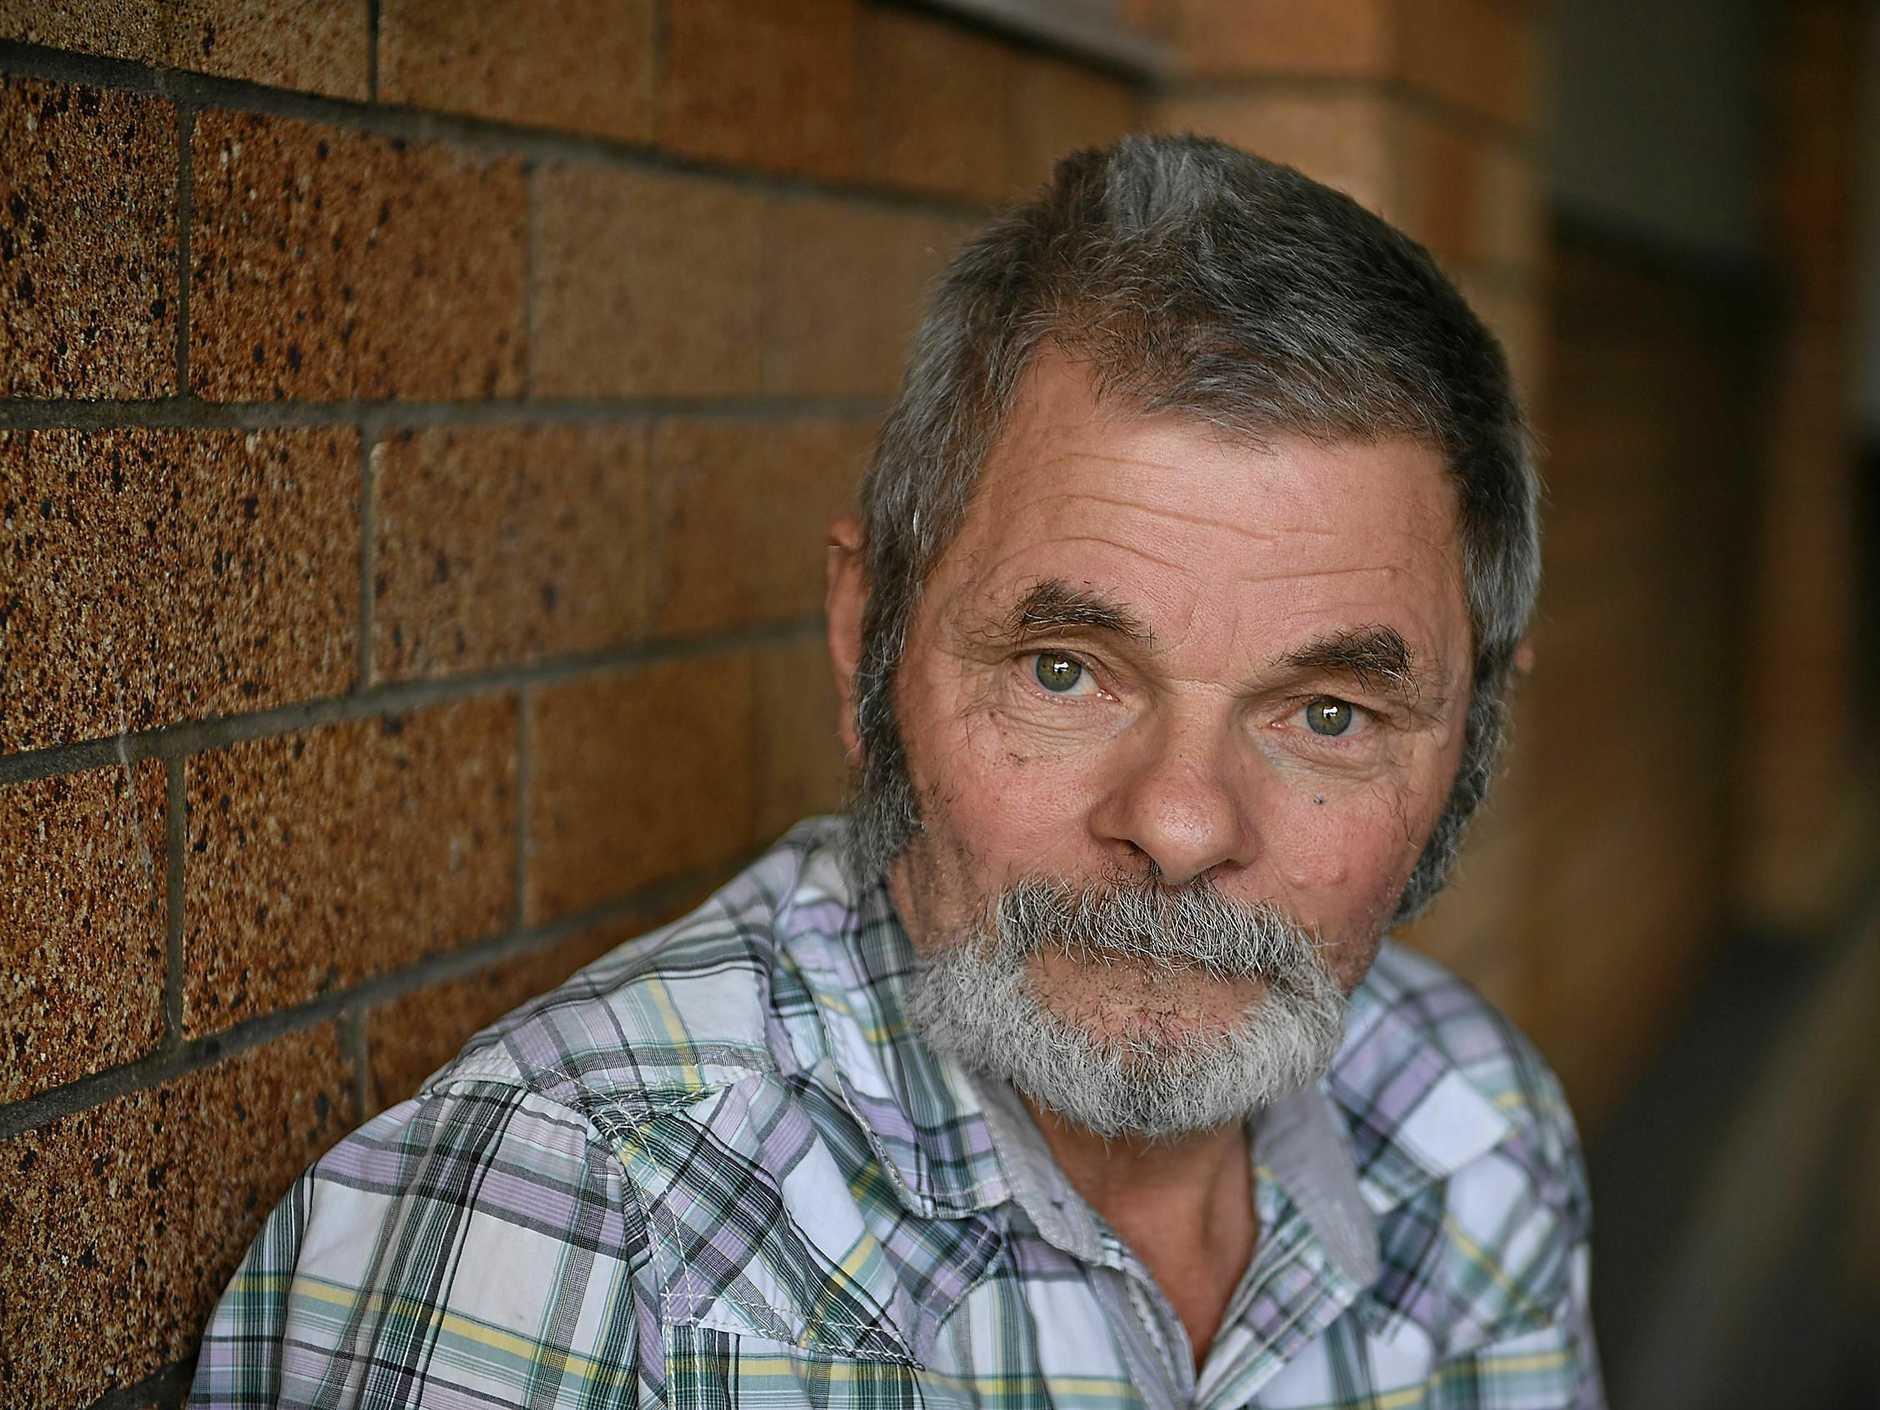 Joe Kiernan from Gympie was an abused orphan at Neerkol.